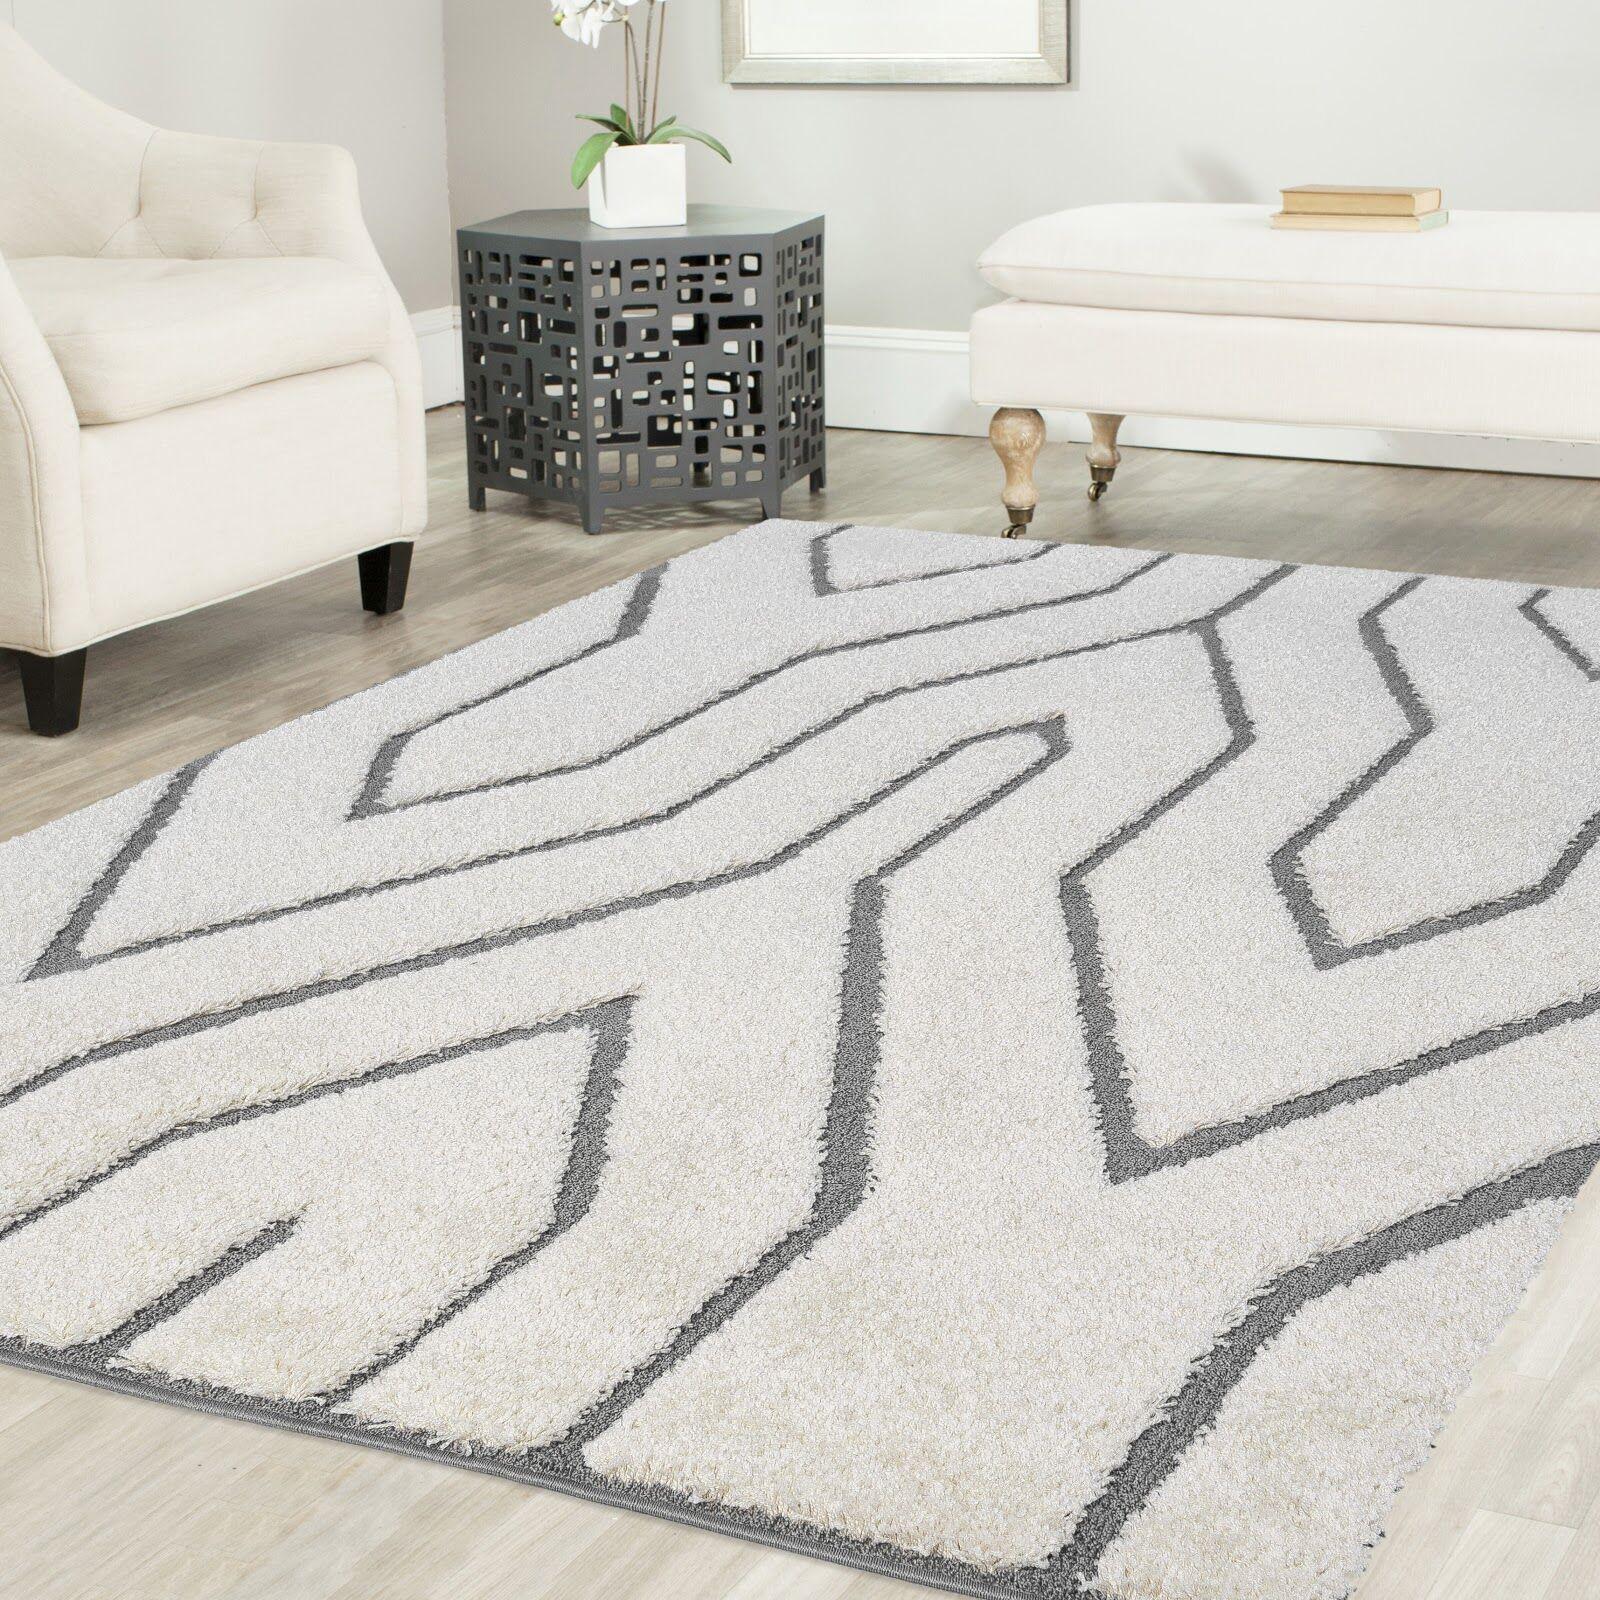 Ruiz Glam Shag White/Gray Area Rug Rug Size: 6' x 6'